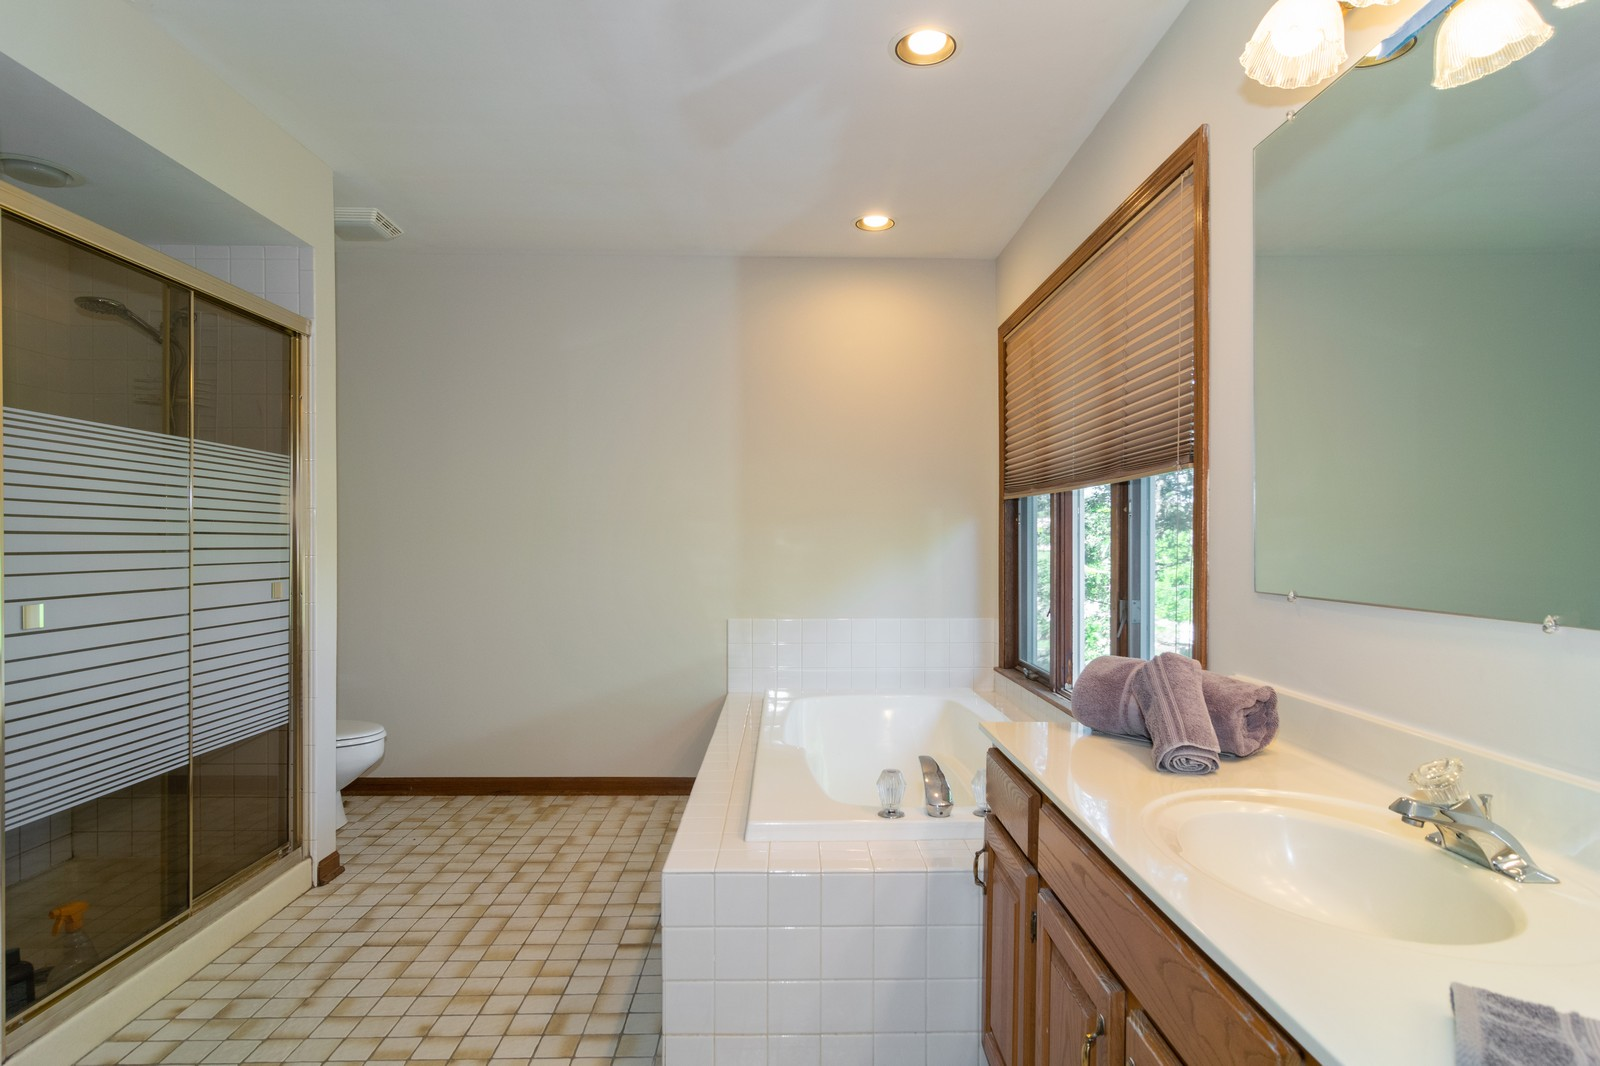 Real Estate Photography - 1508 Eton, Arlington Heights, IL, 60004 - Master Bathroom